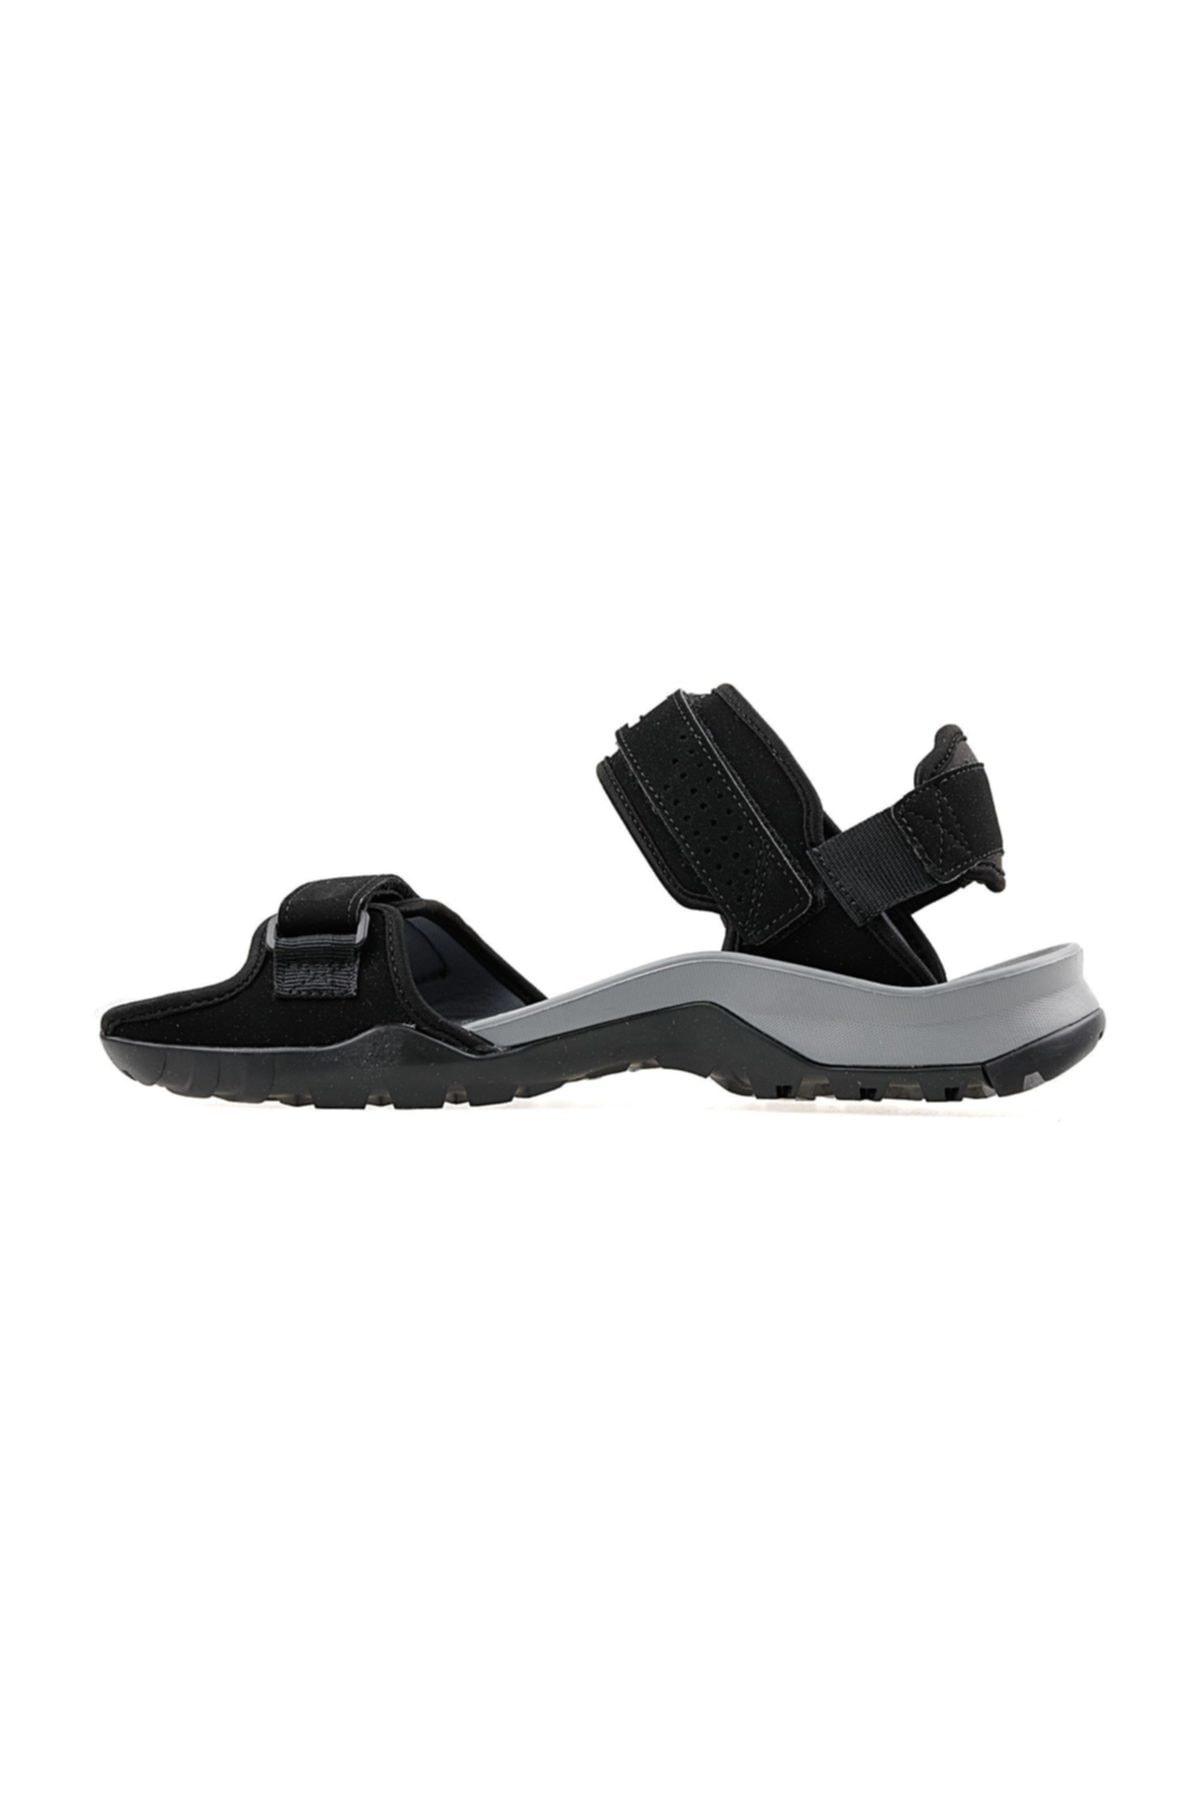 adidas Erkek Outdoor Sandaleti Spor Siyah B44191 Cyprex Ultra Sandalet 2